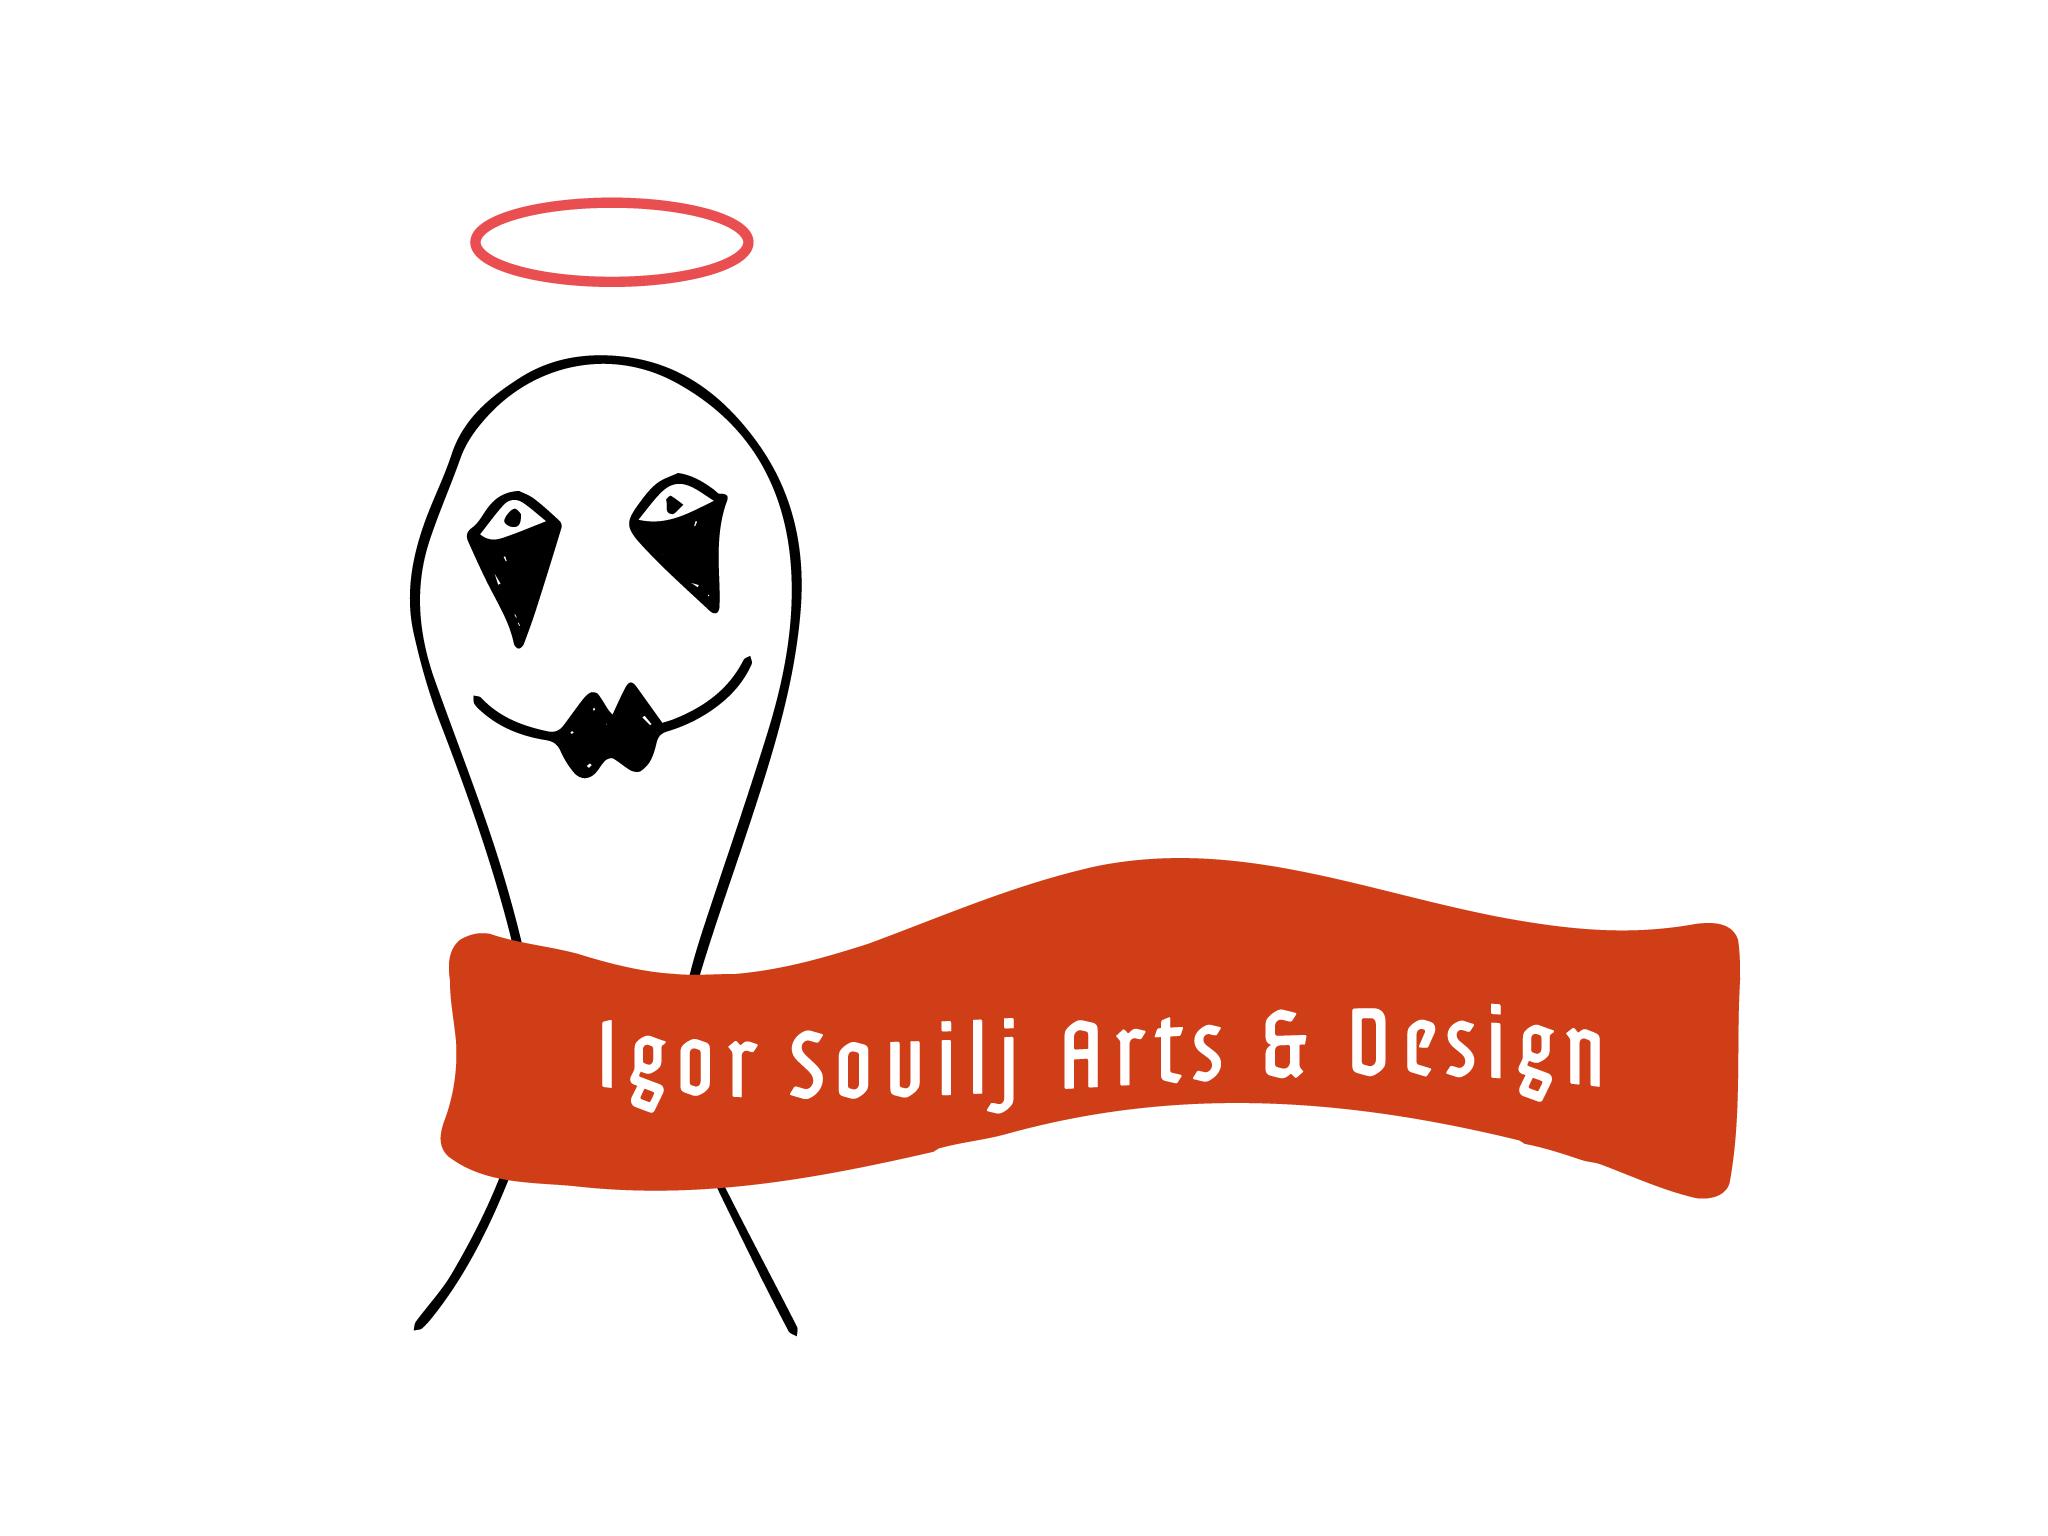 Igor Sovilj